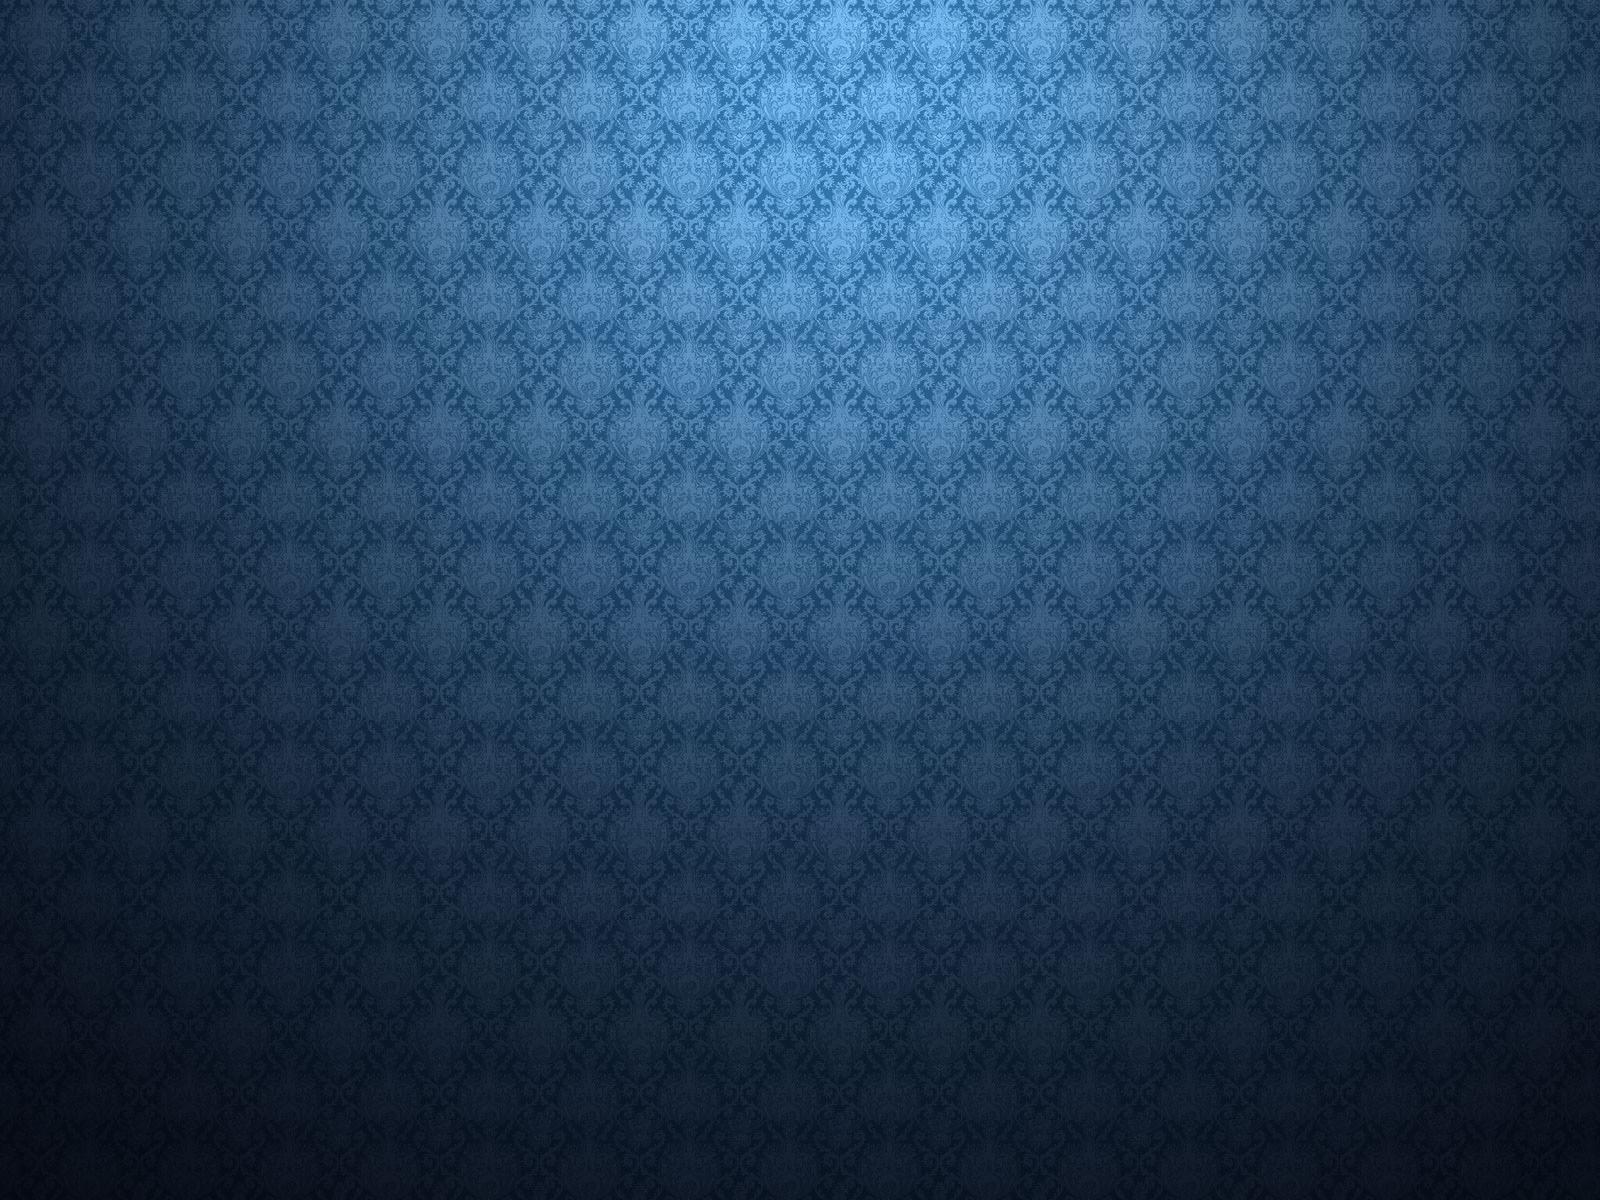 Hd blue texture wallpapers hd wallpapers - Papier peint vintage bleu ...